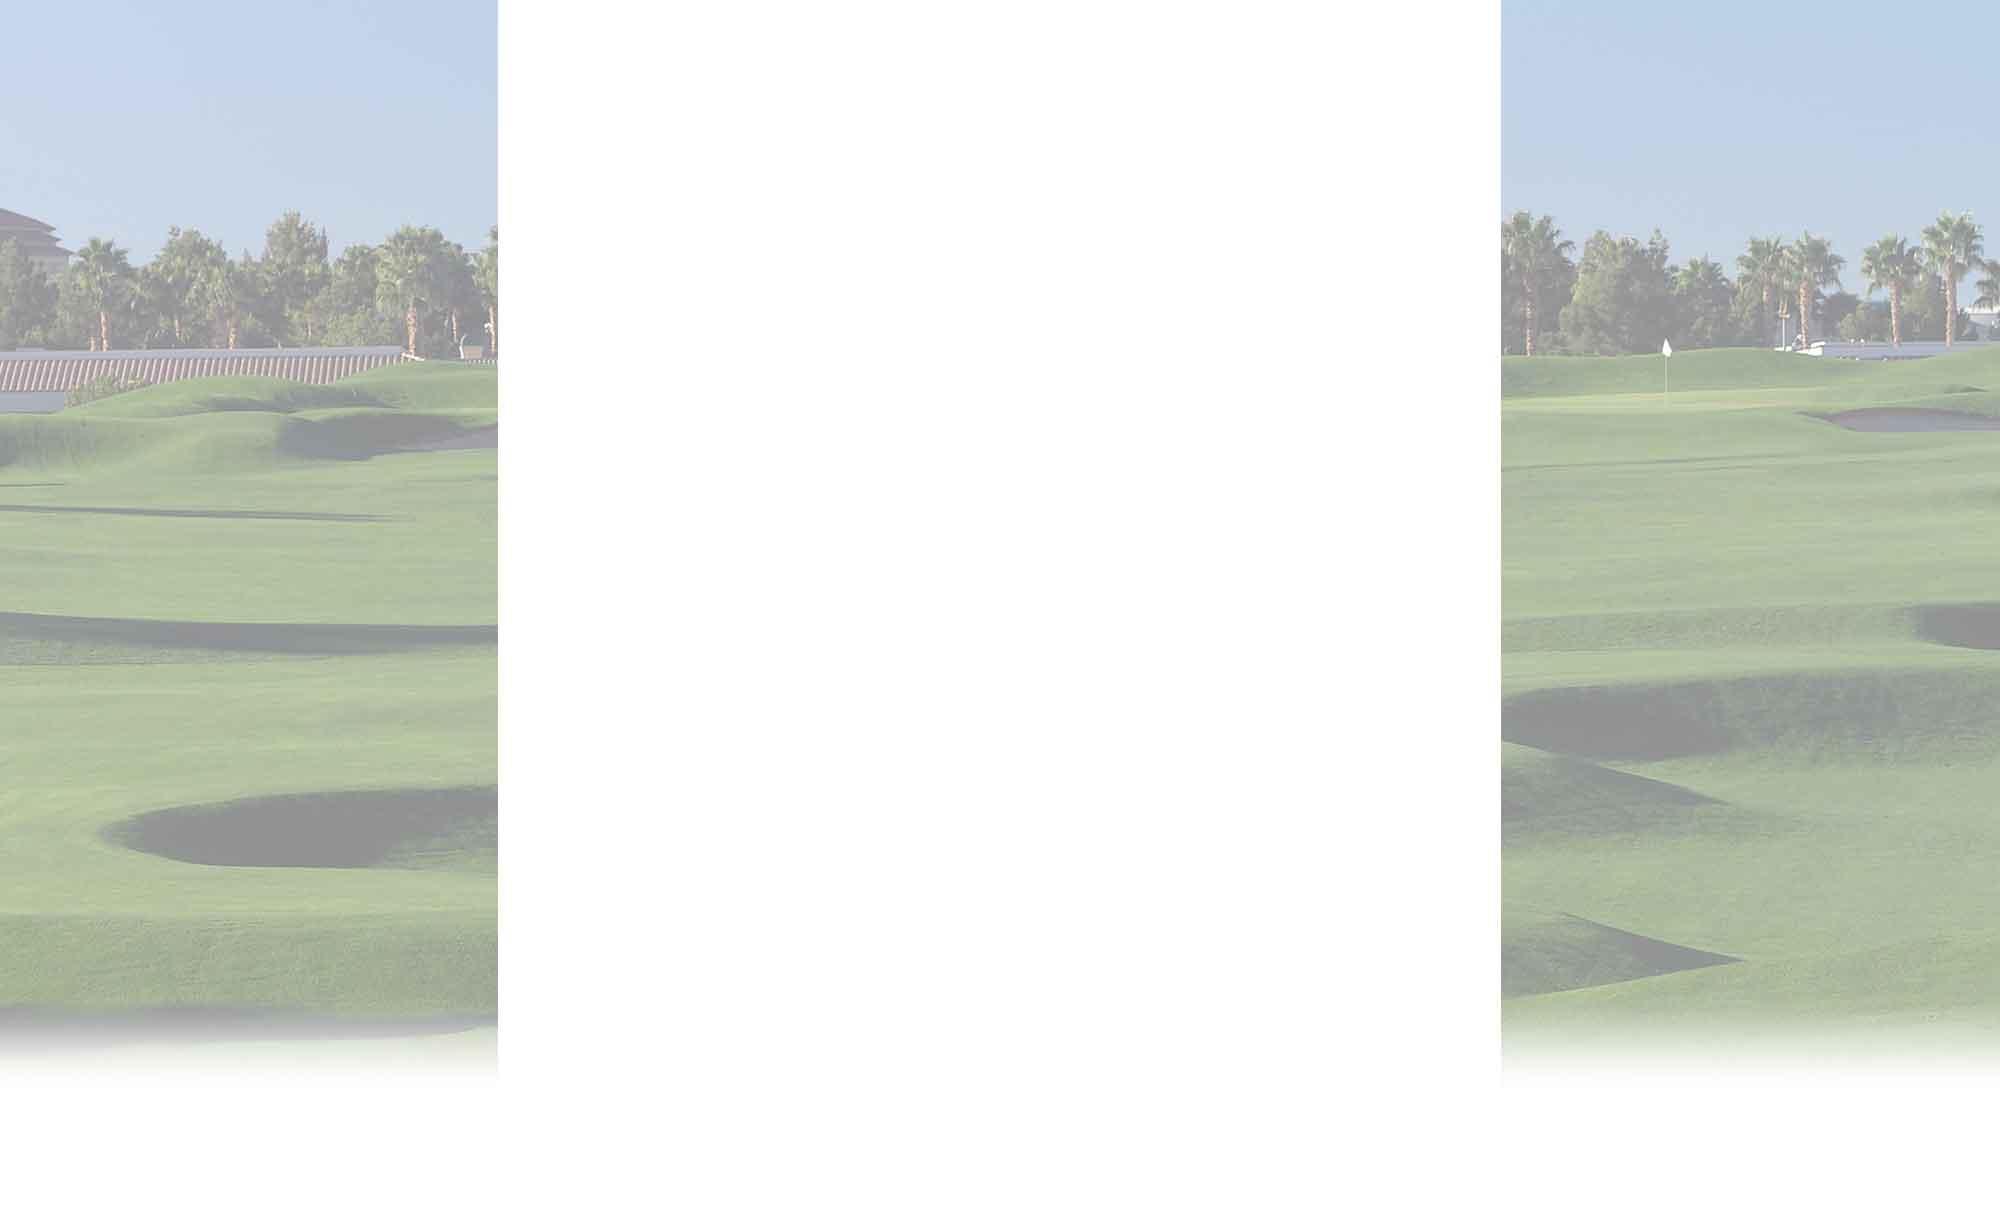 Golf Courses In Las Vegas Map.Las Vegas Golf Courses Vegas Com